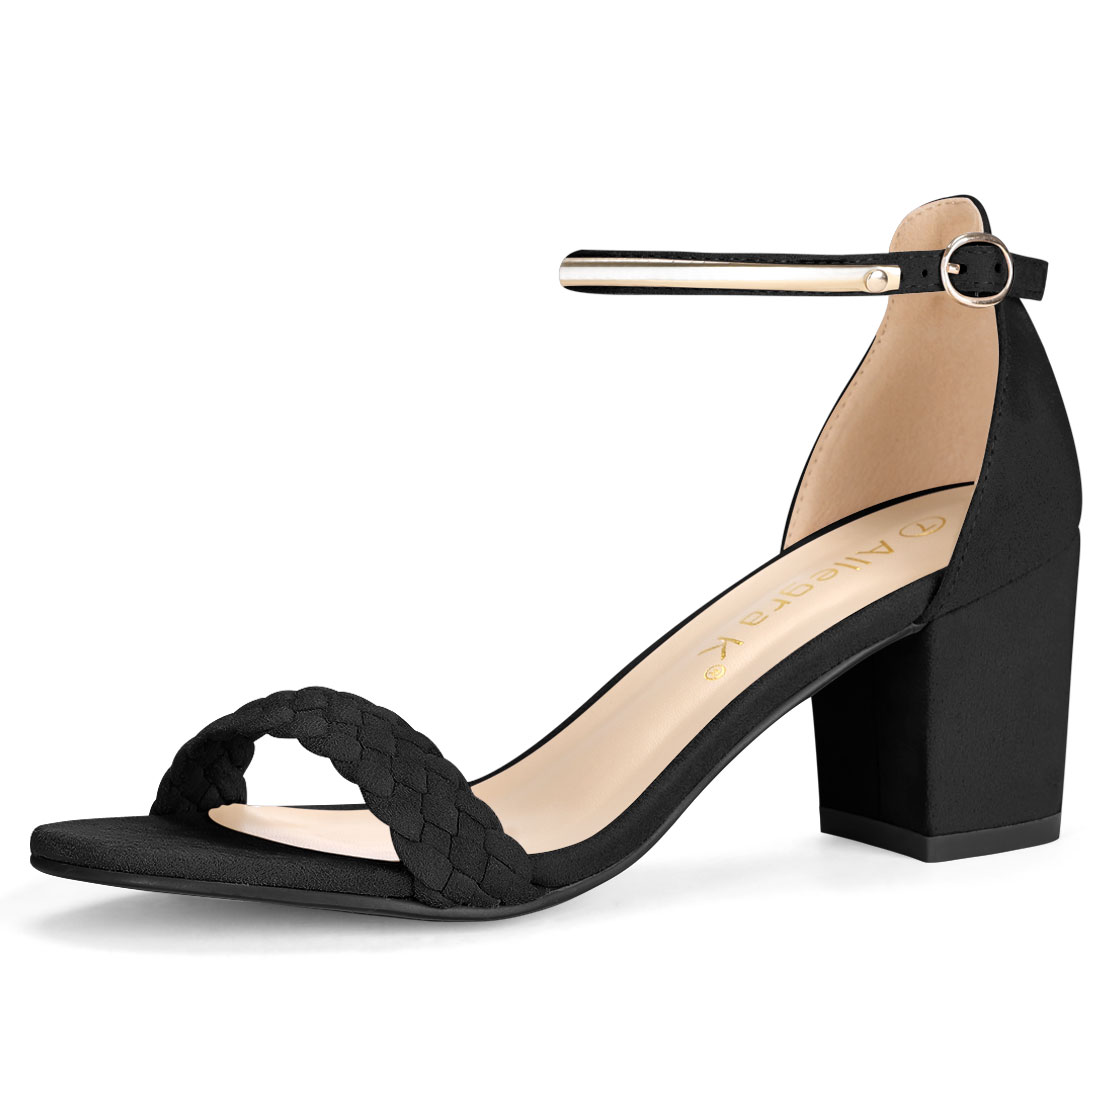 Women Open Toe Mid Heel Braided Ankle Strap Sandals Black US 7